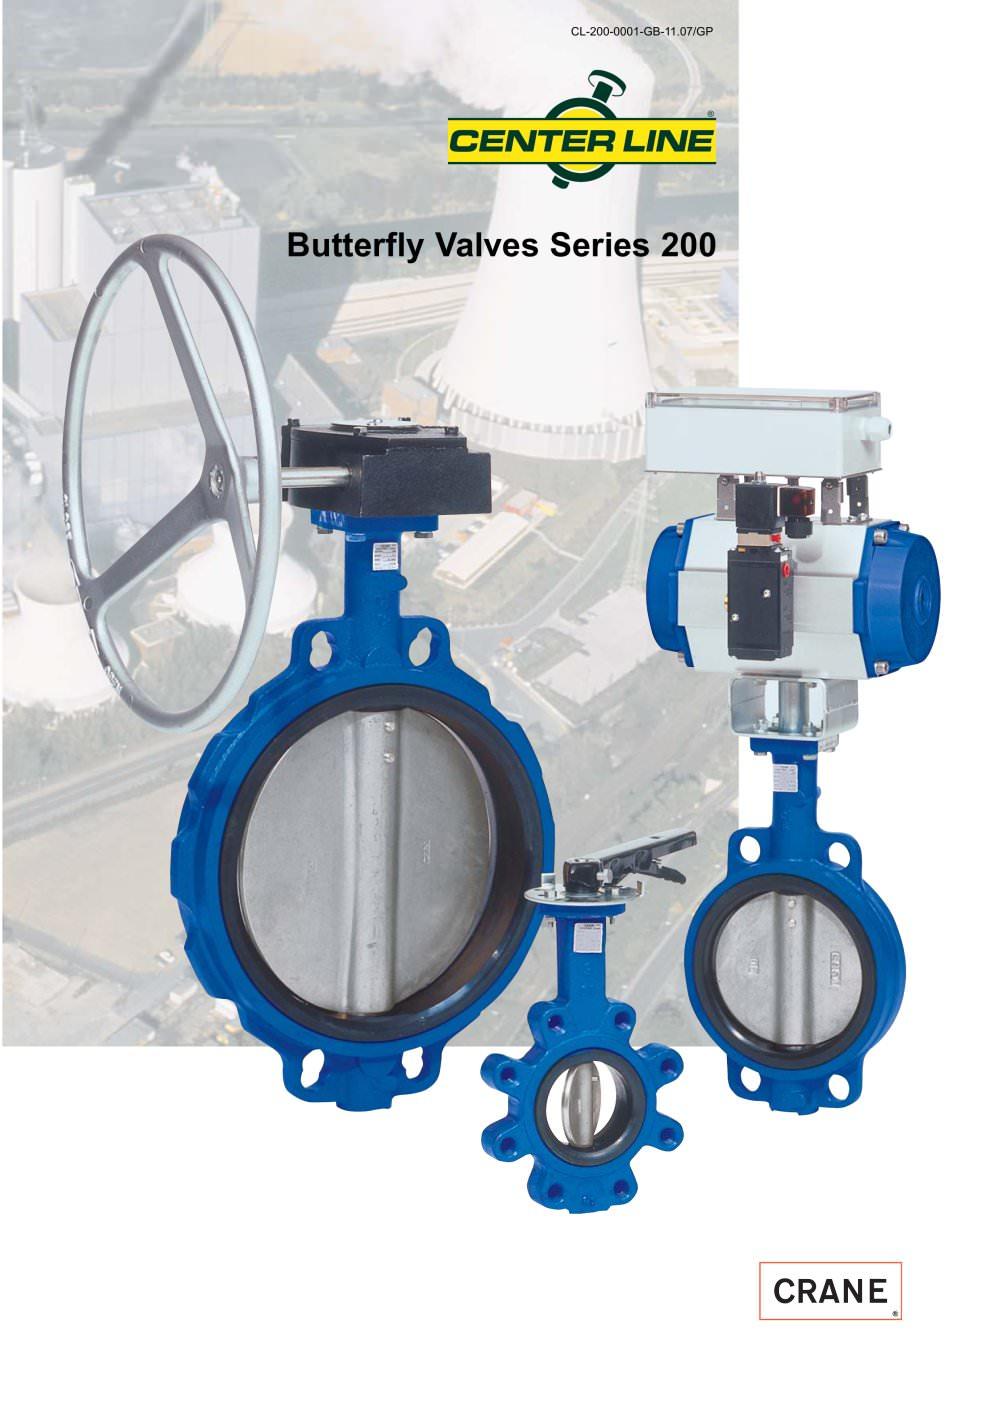 Centerline Butterfly Valves Series 200 Crane Process Flow